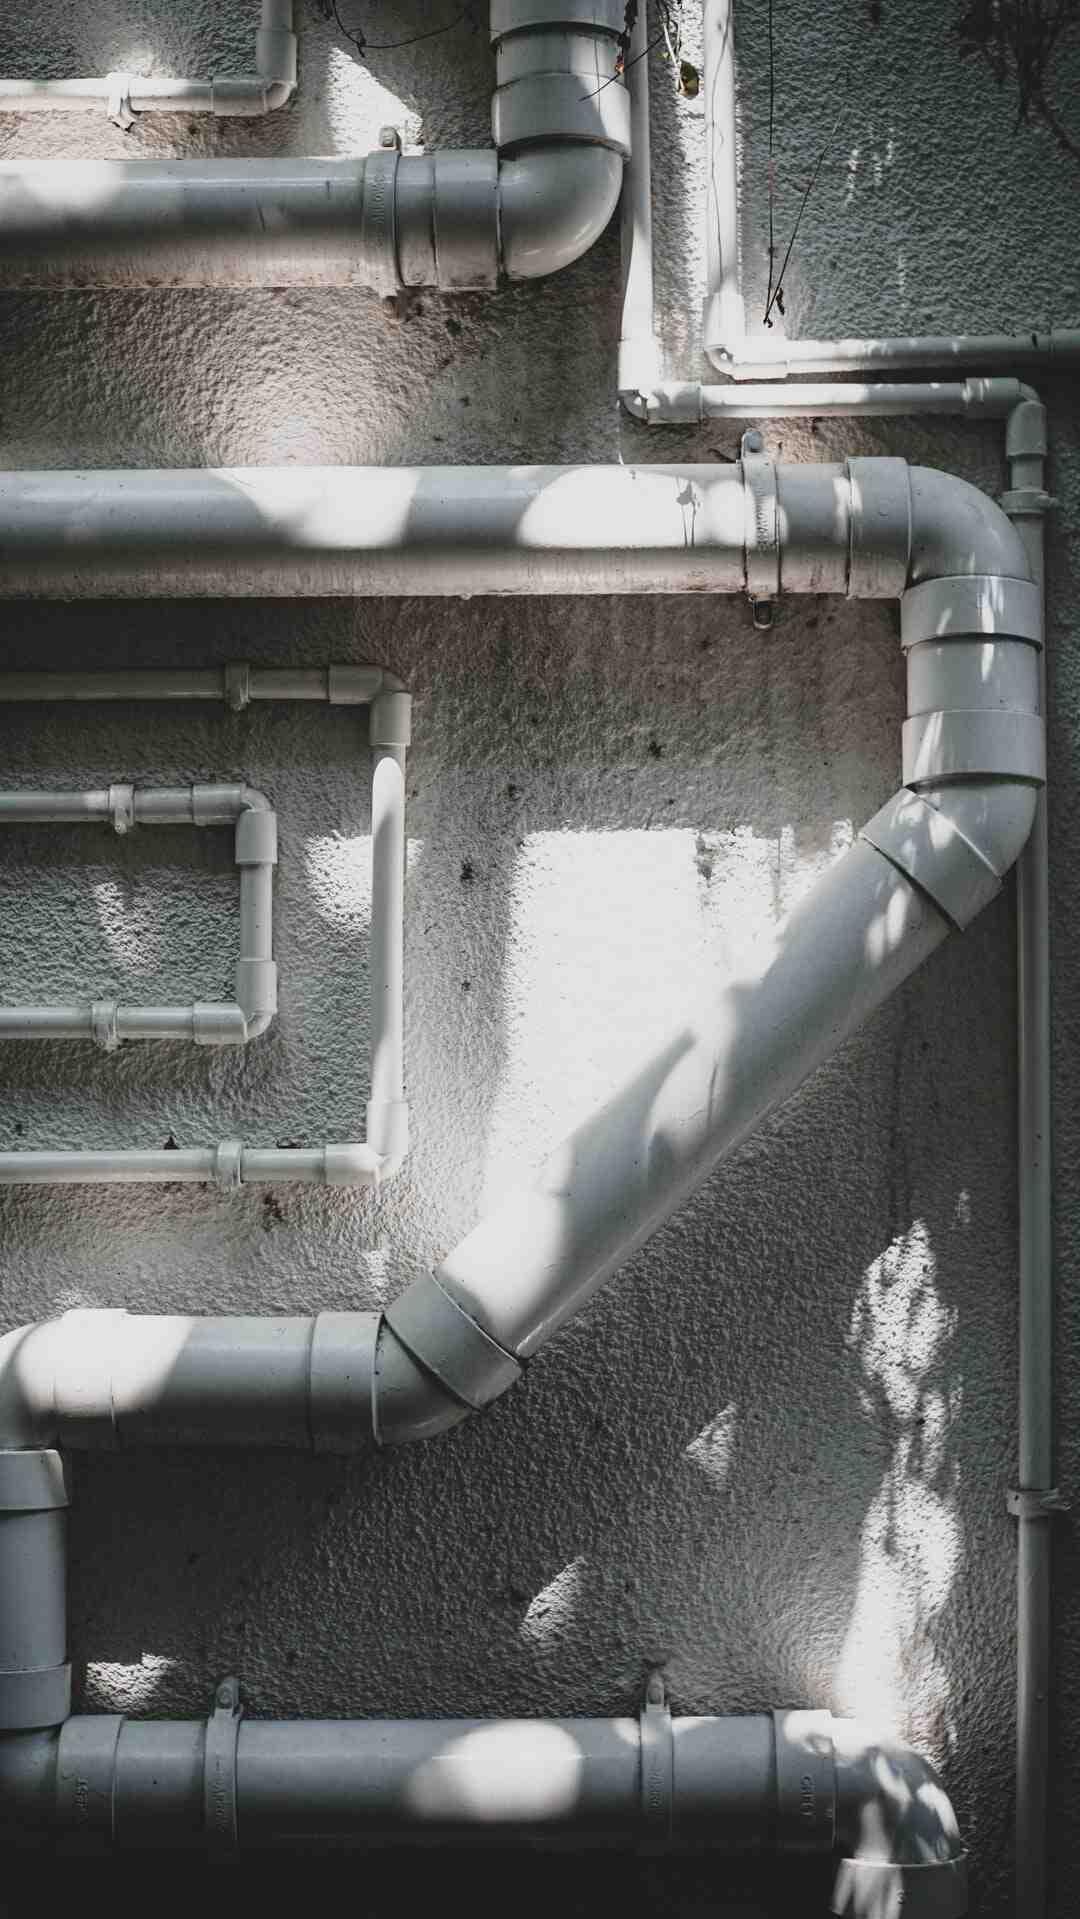 Comment installer plomberie pex